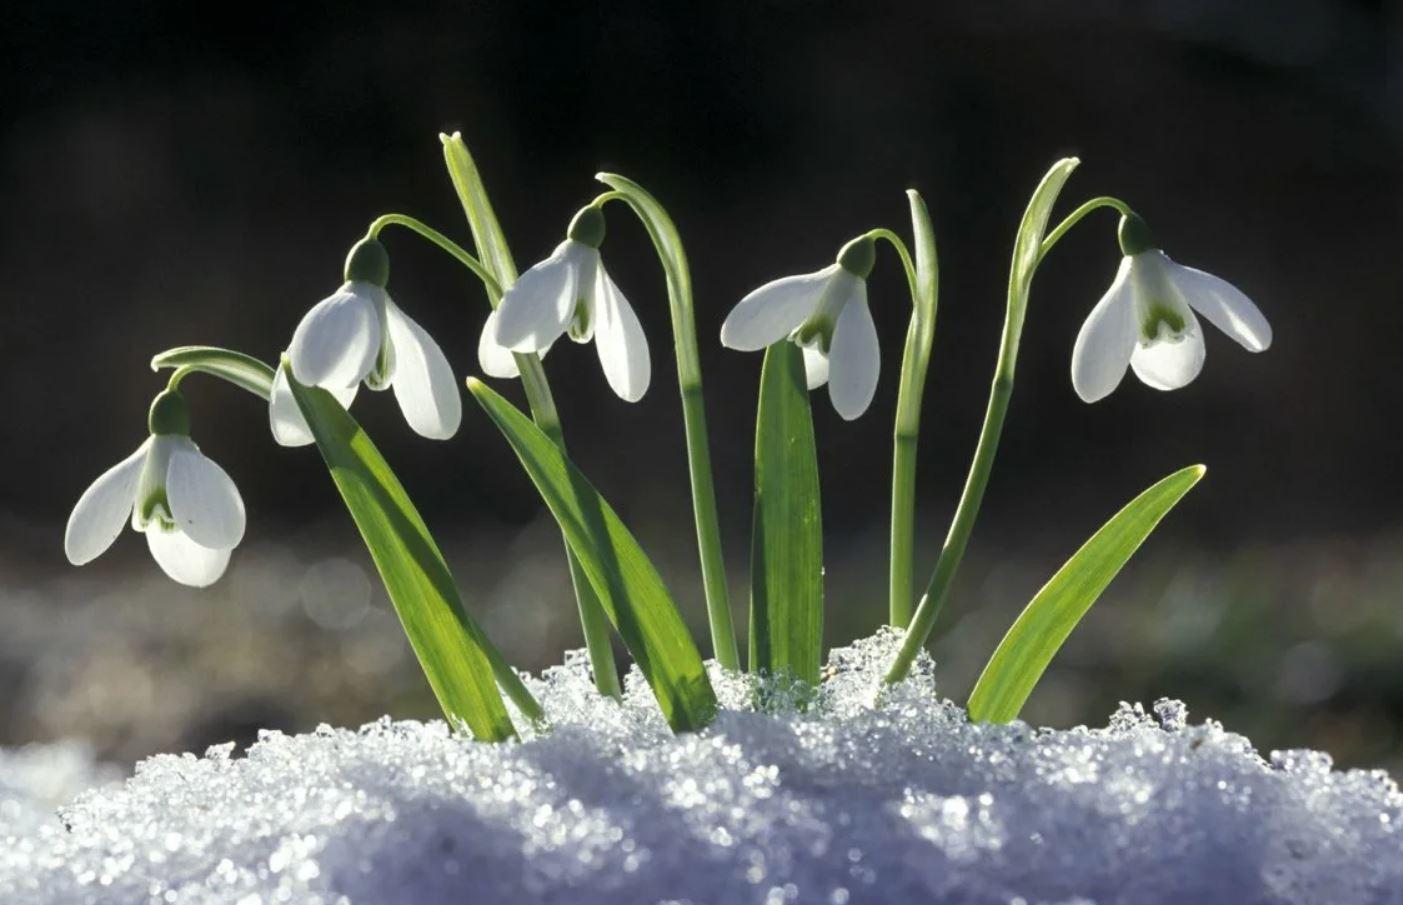 картинки весна природа (15)